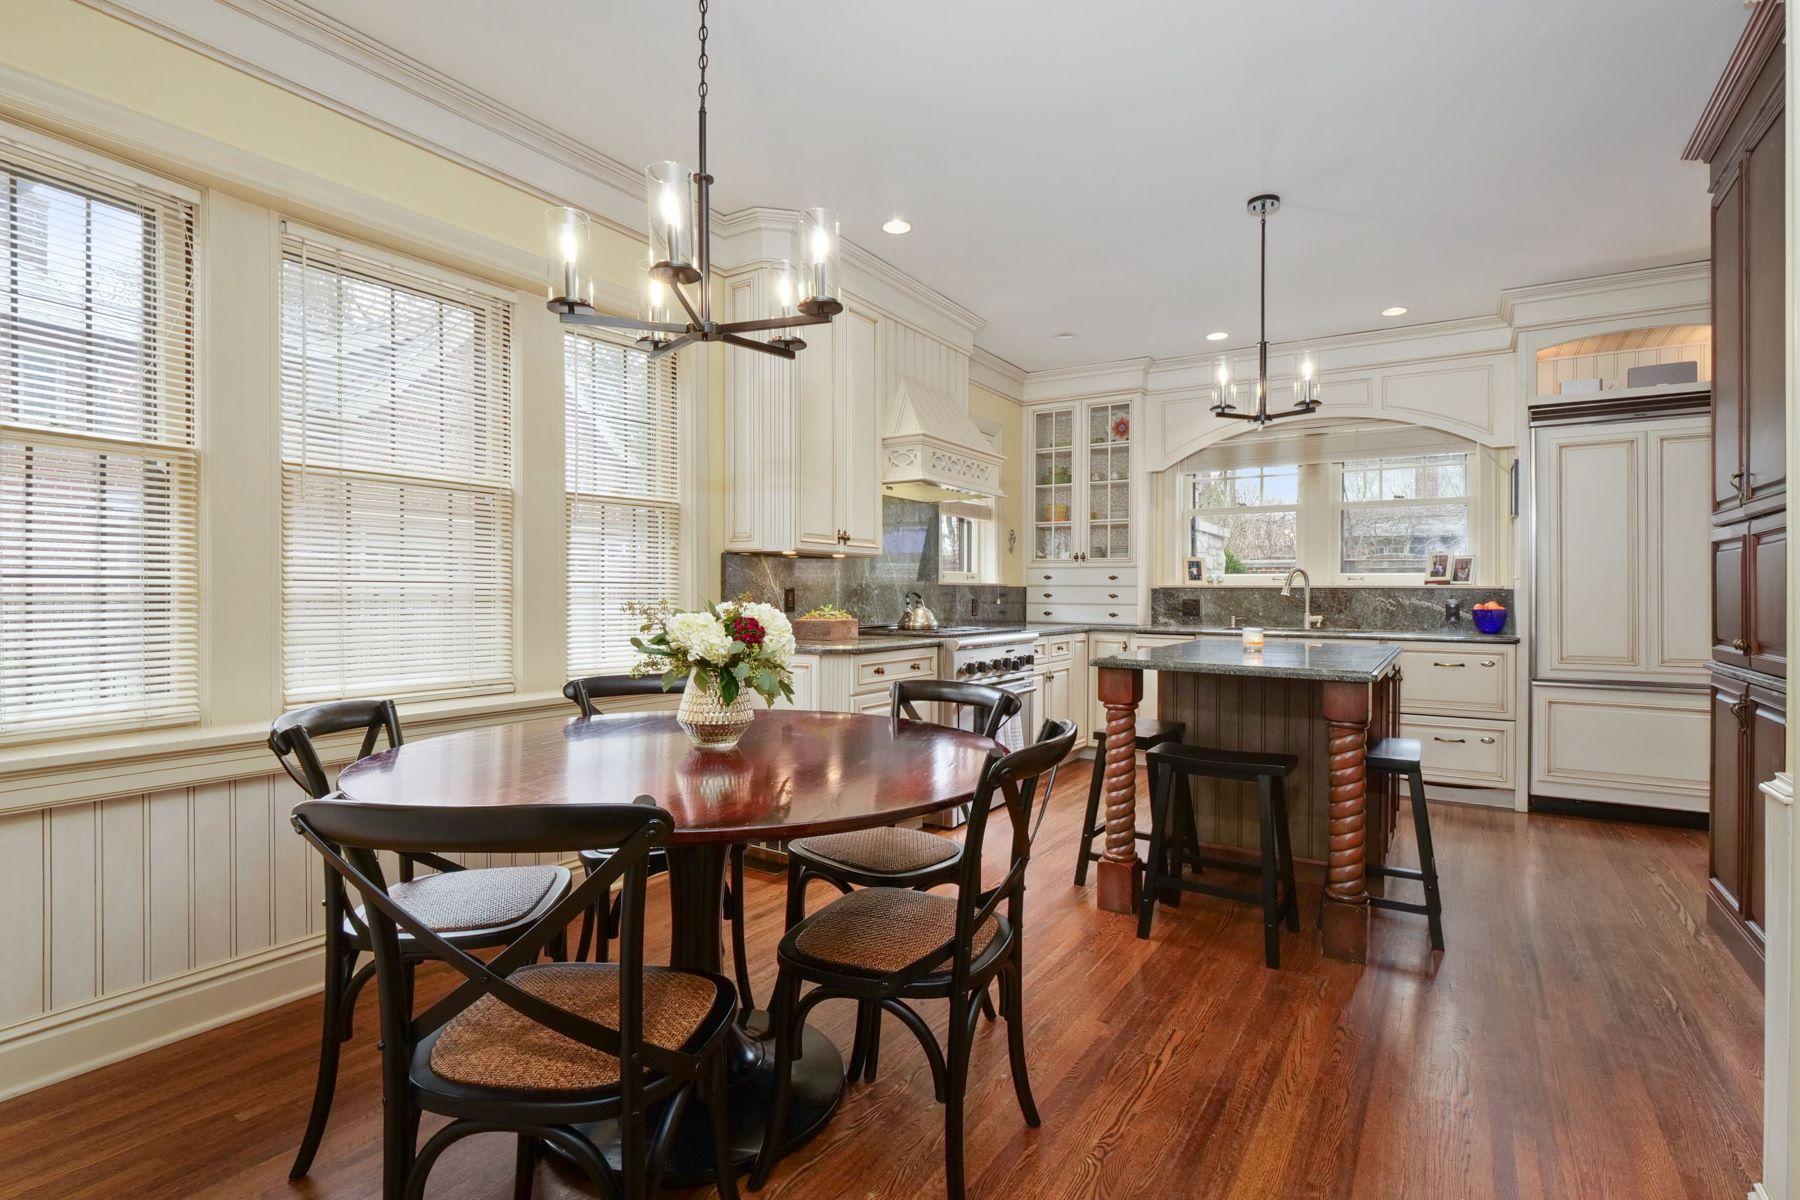 Additional photo for property listing at Stunning University Hill Manse 7257 Greenway Avenue University City, Missouri 63130 United States